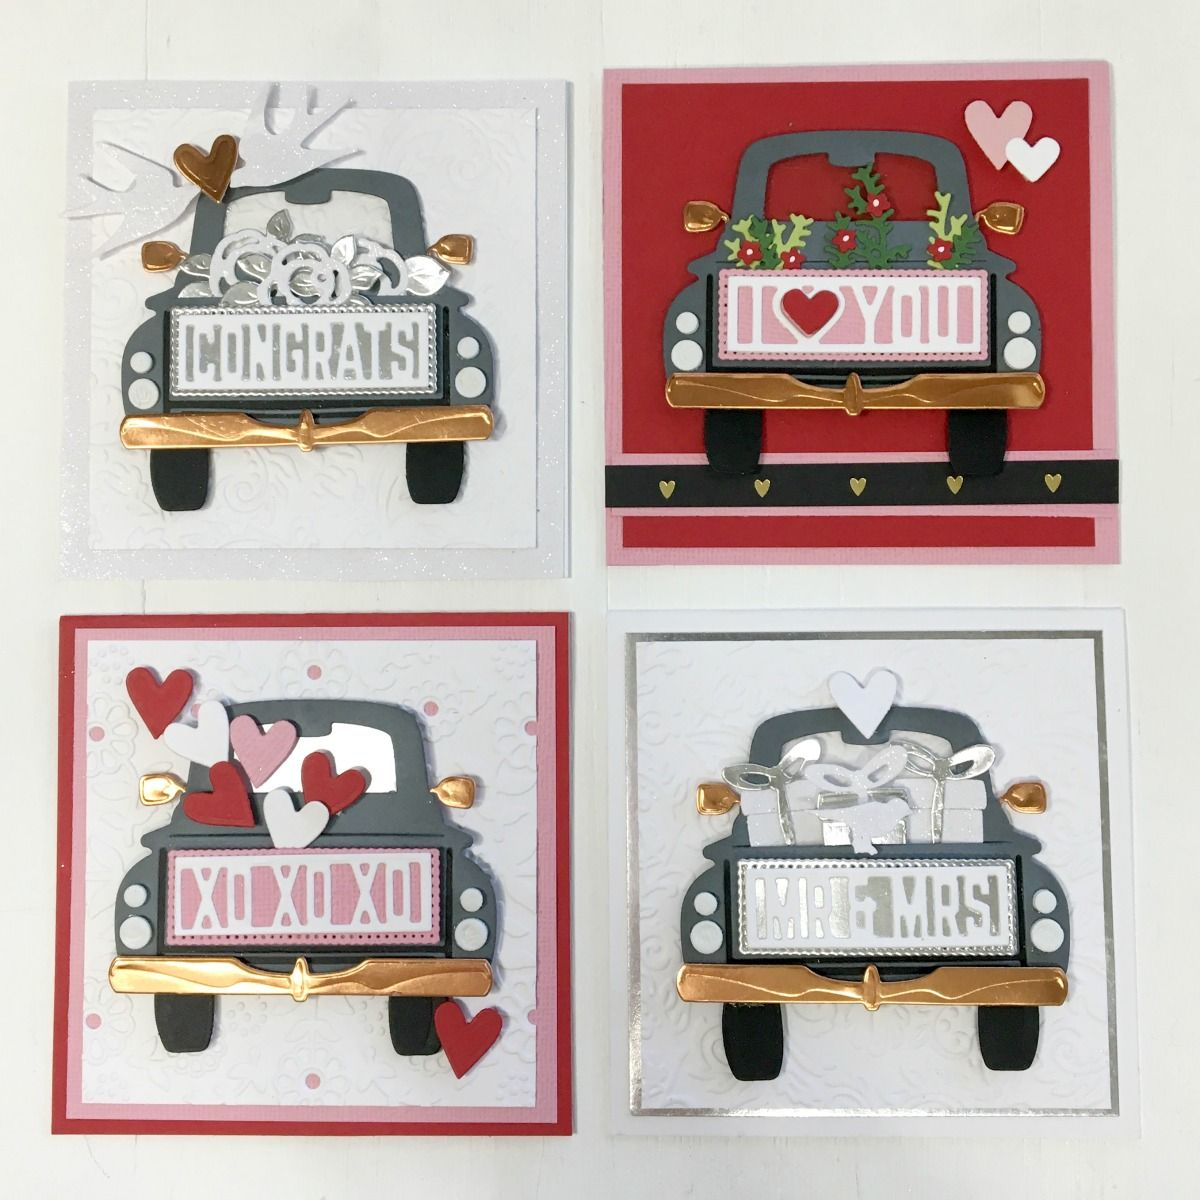 Truck Frame Cutting Dies Car Scrapbook Paper Cards Album Embossing Stencils Mold